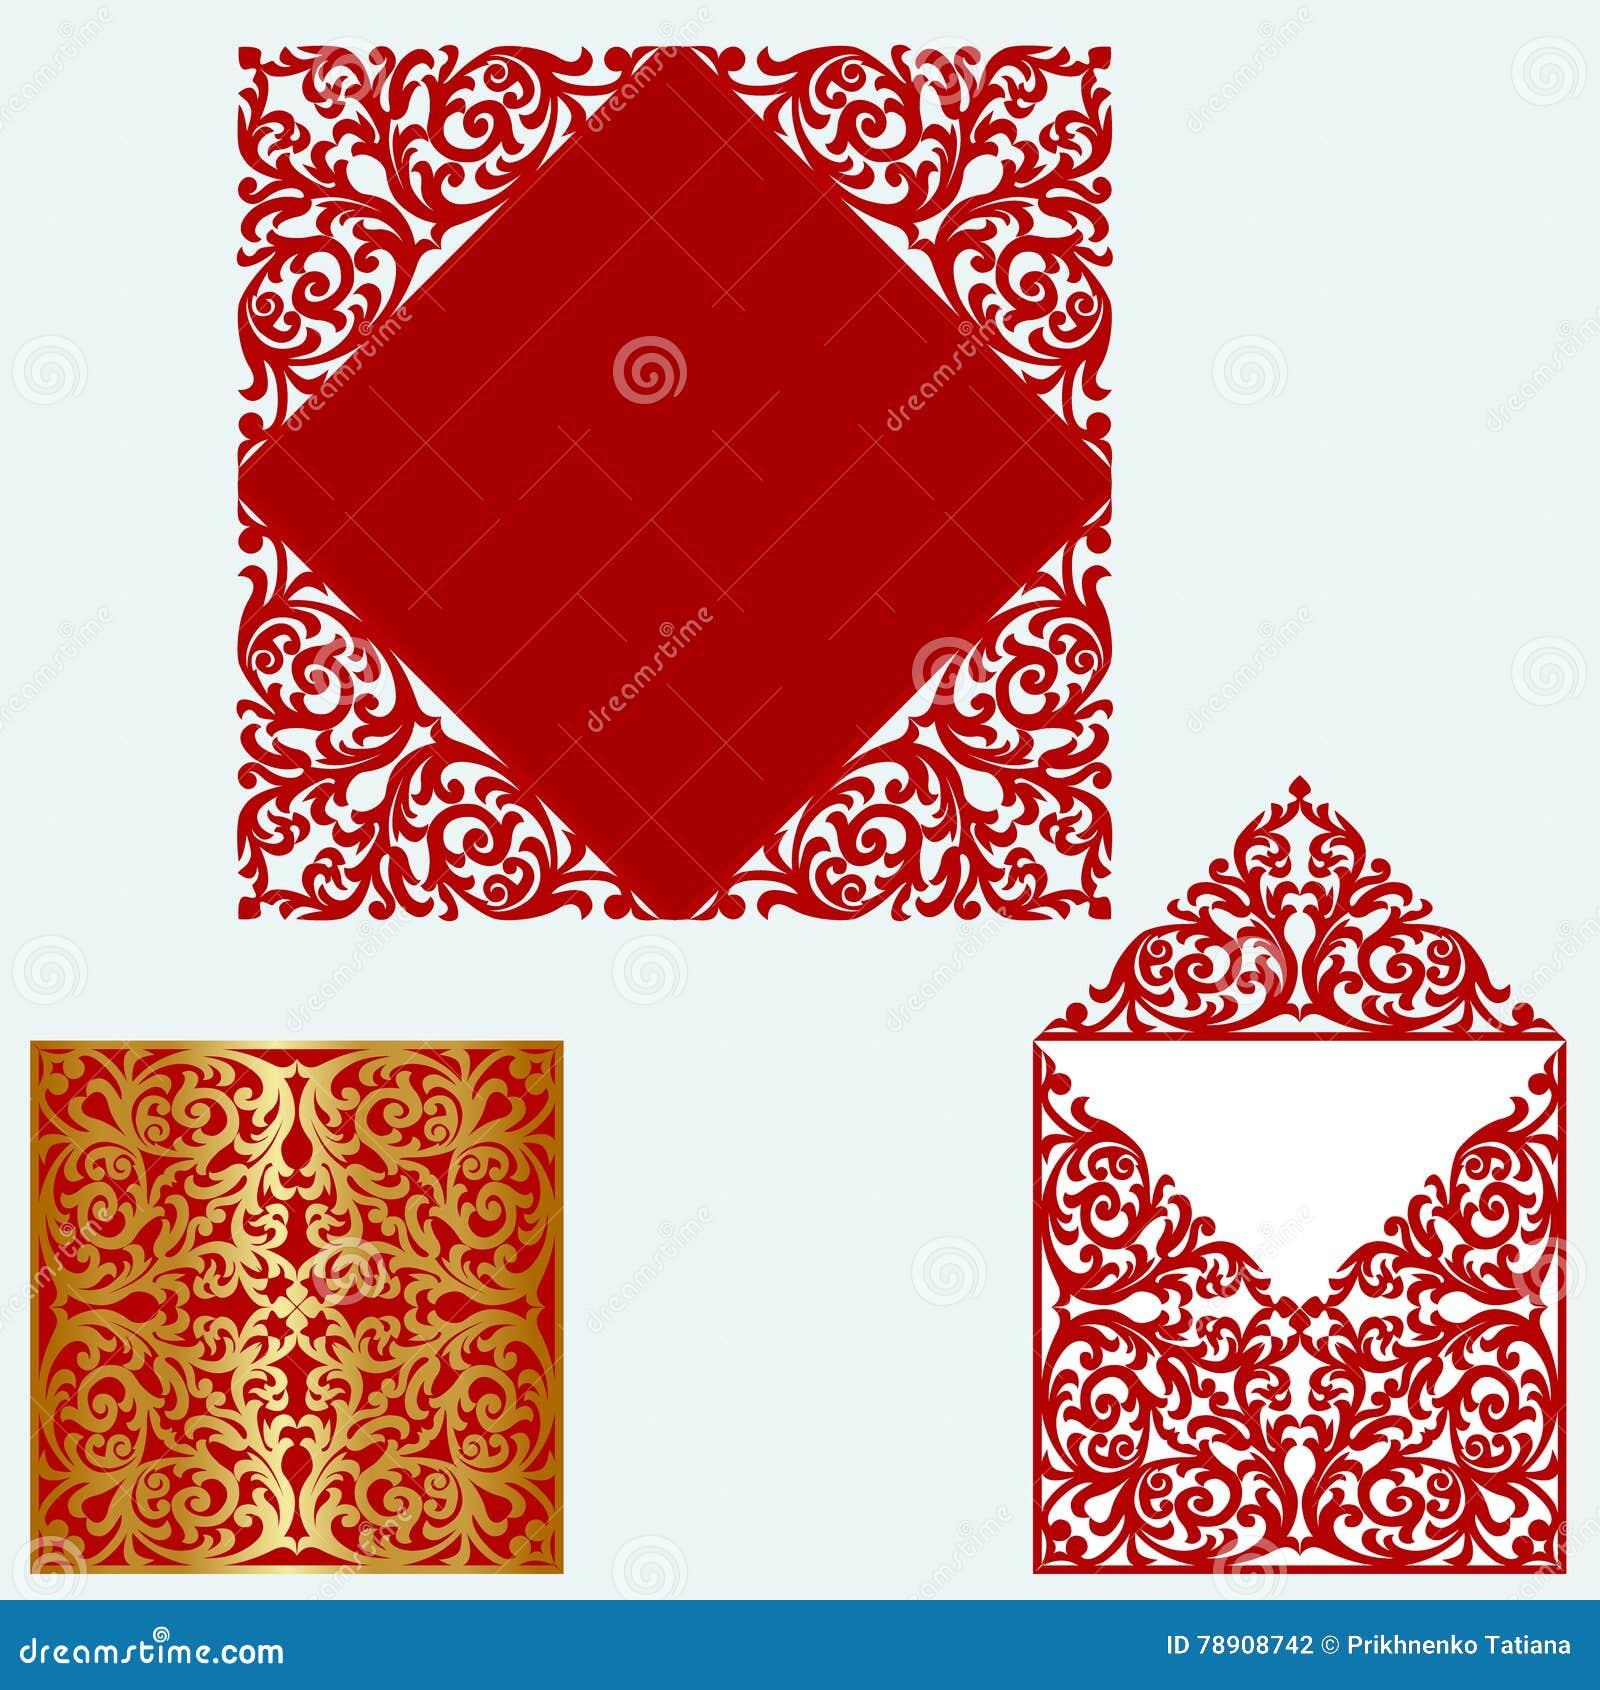 Layout wedding invitation stock vector. Illustration of template ...